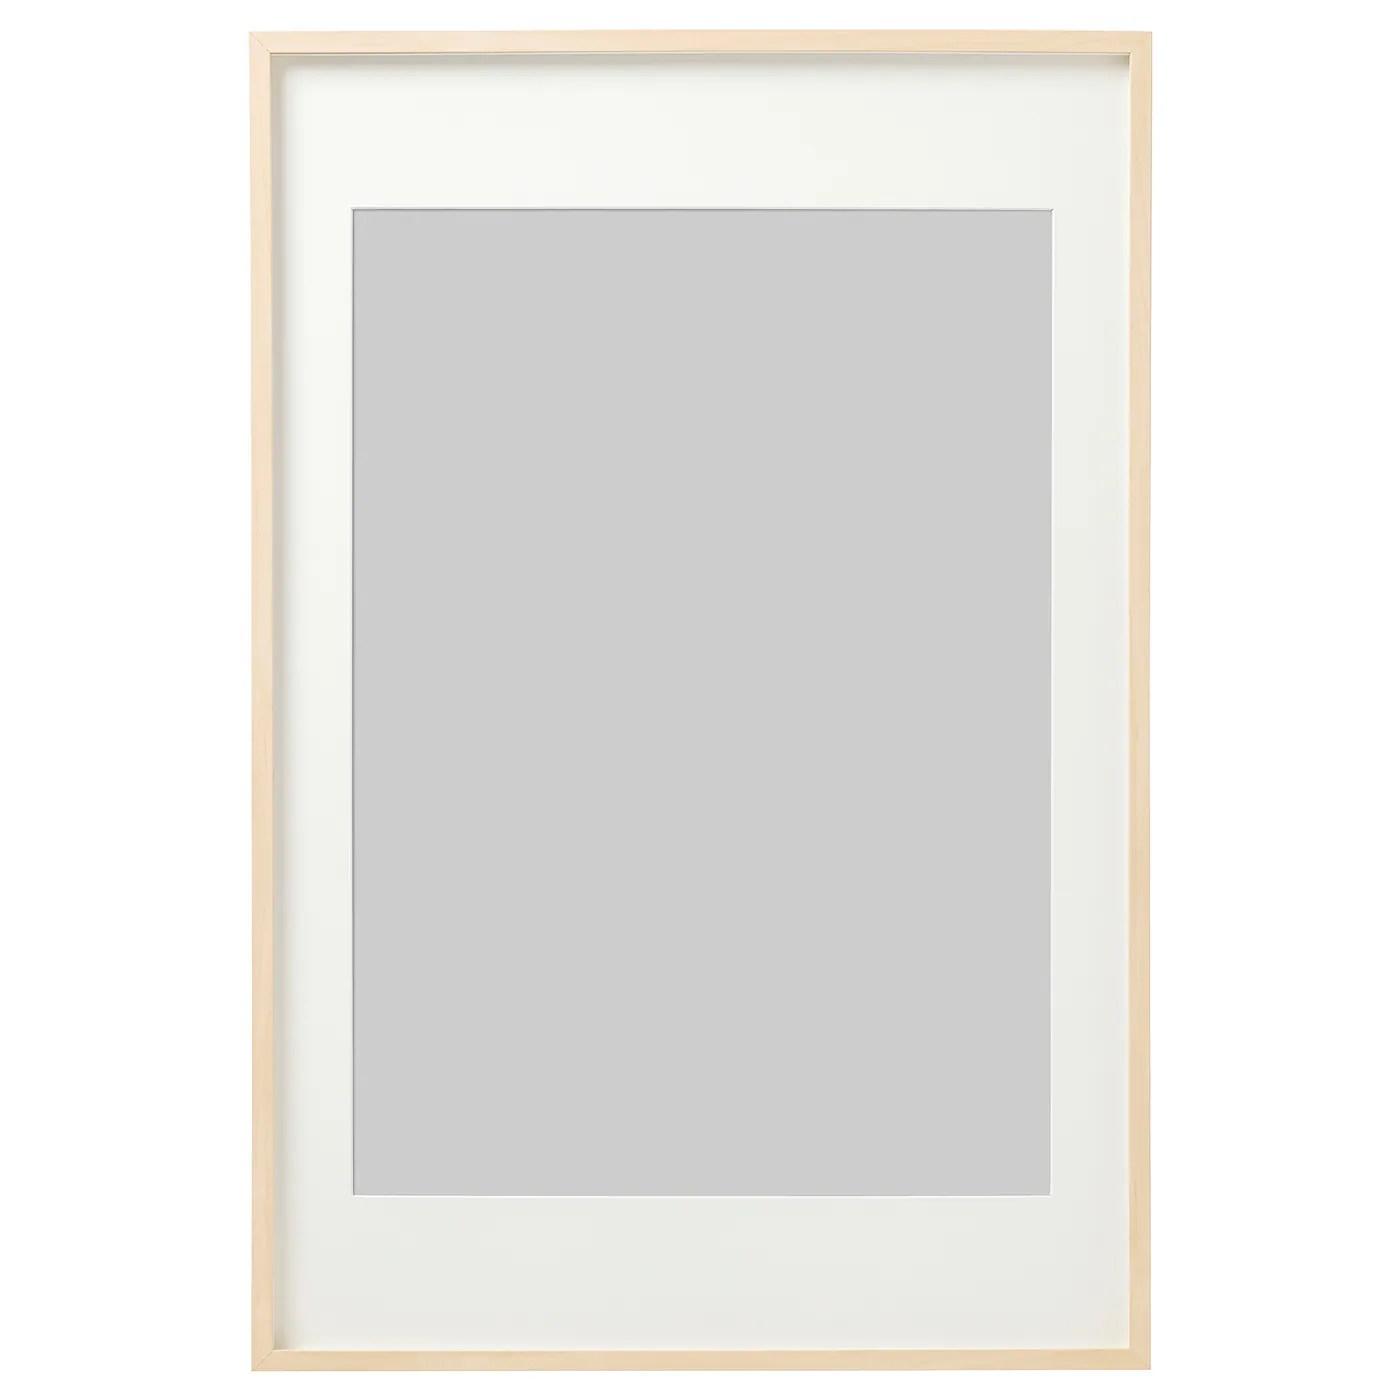 Hovsta Frame Birch Effect 61x91 Cm Ikea